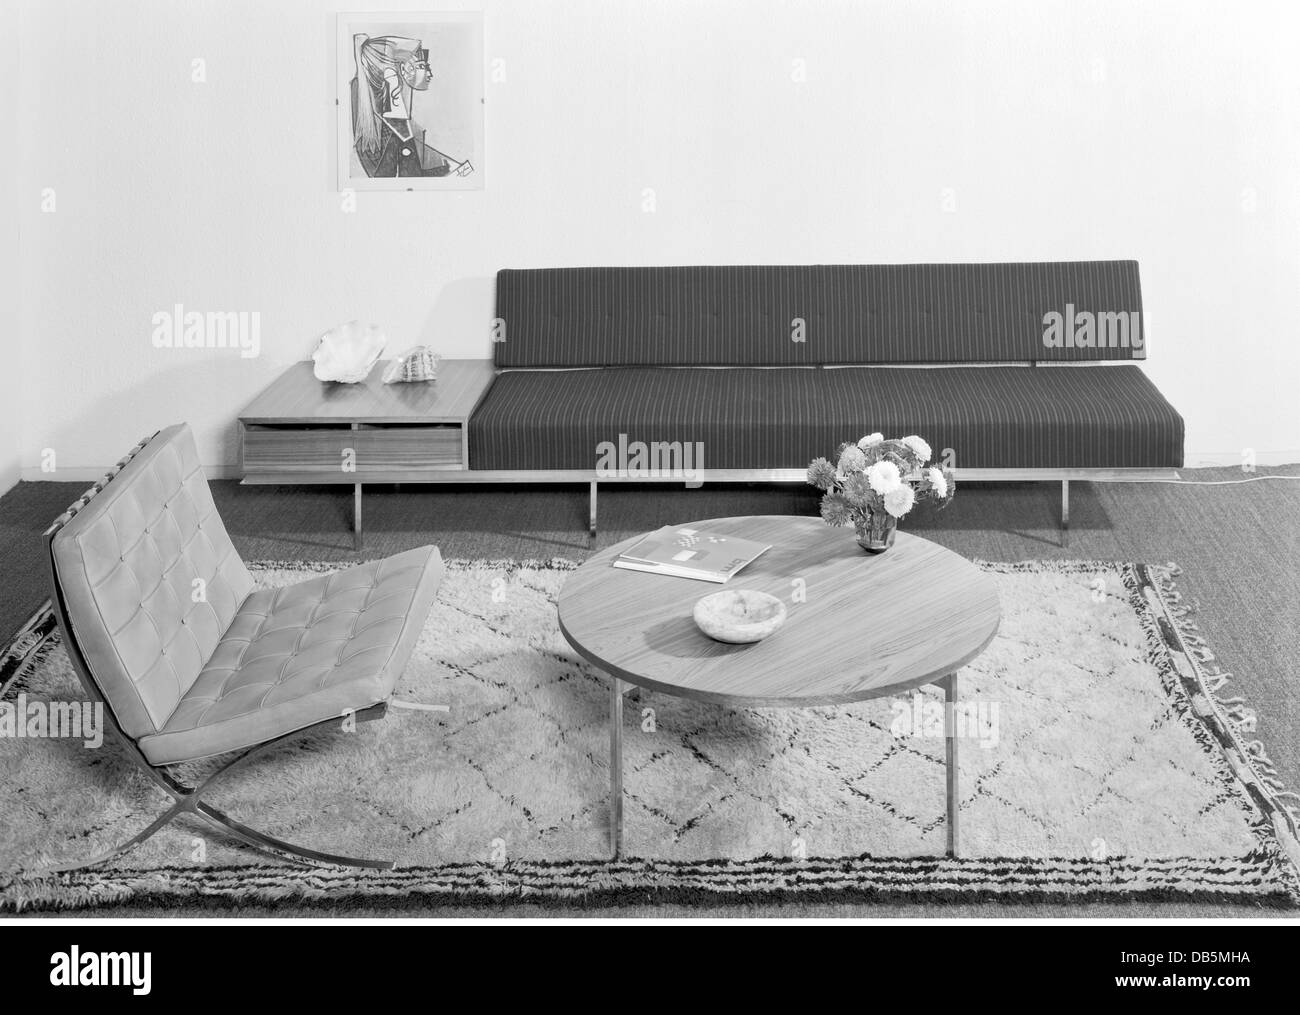 Furniture, Living Room, 1960, 1960s, 60s, 20th Century, Historic,  Historical, Seating Furniture, Couch, Chaise, Chaise Longue, C